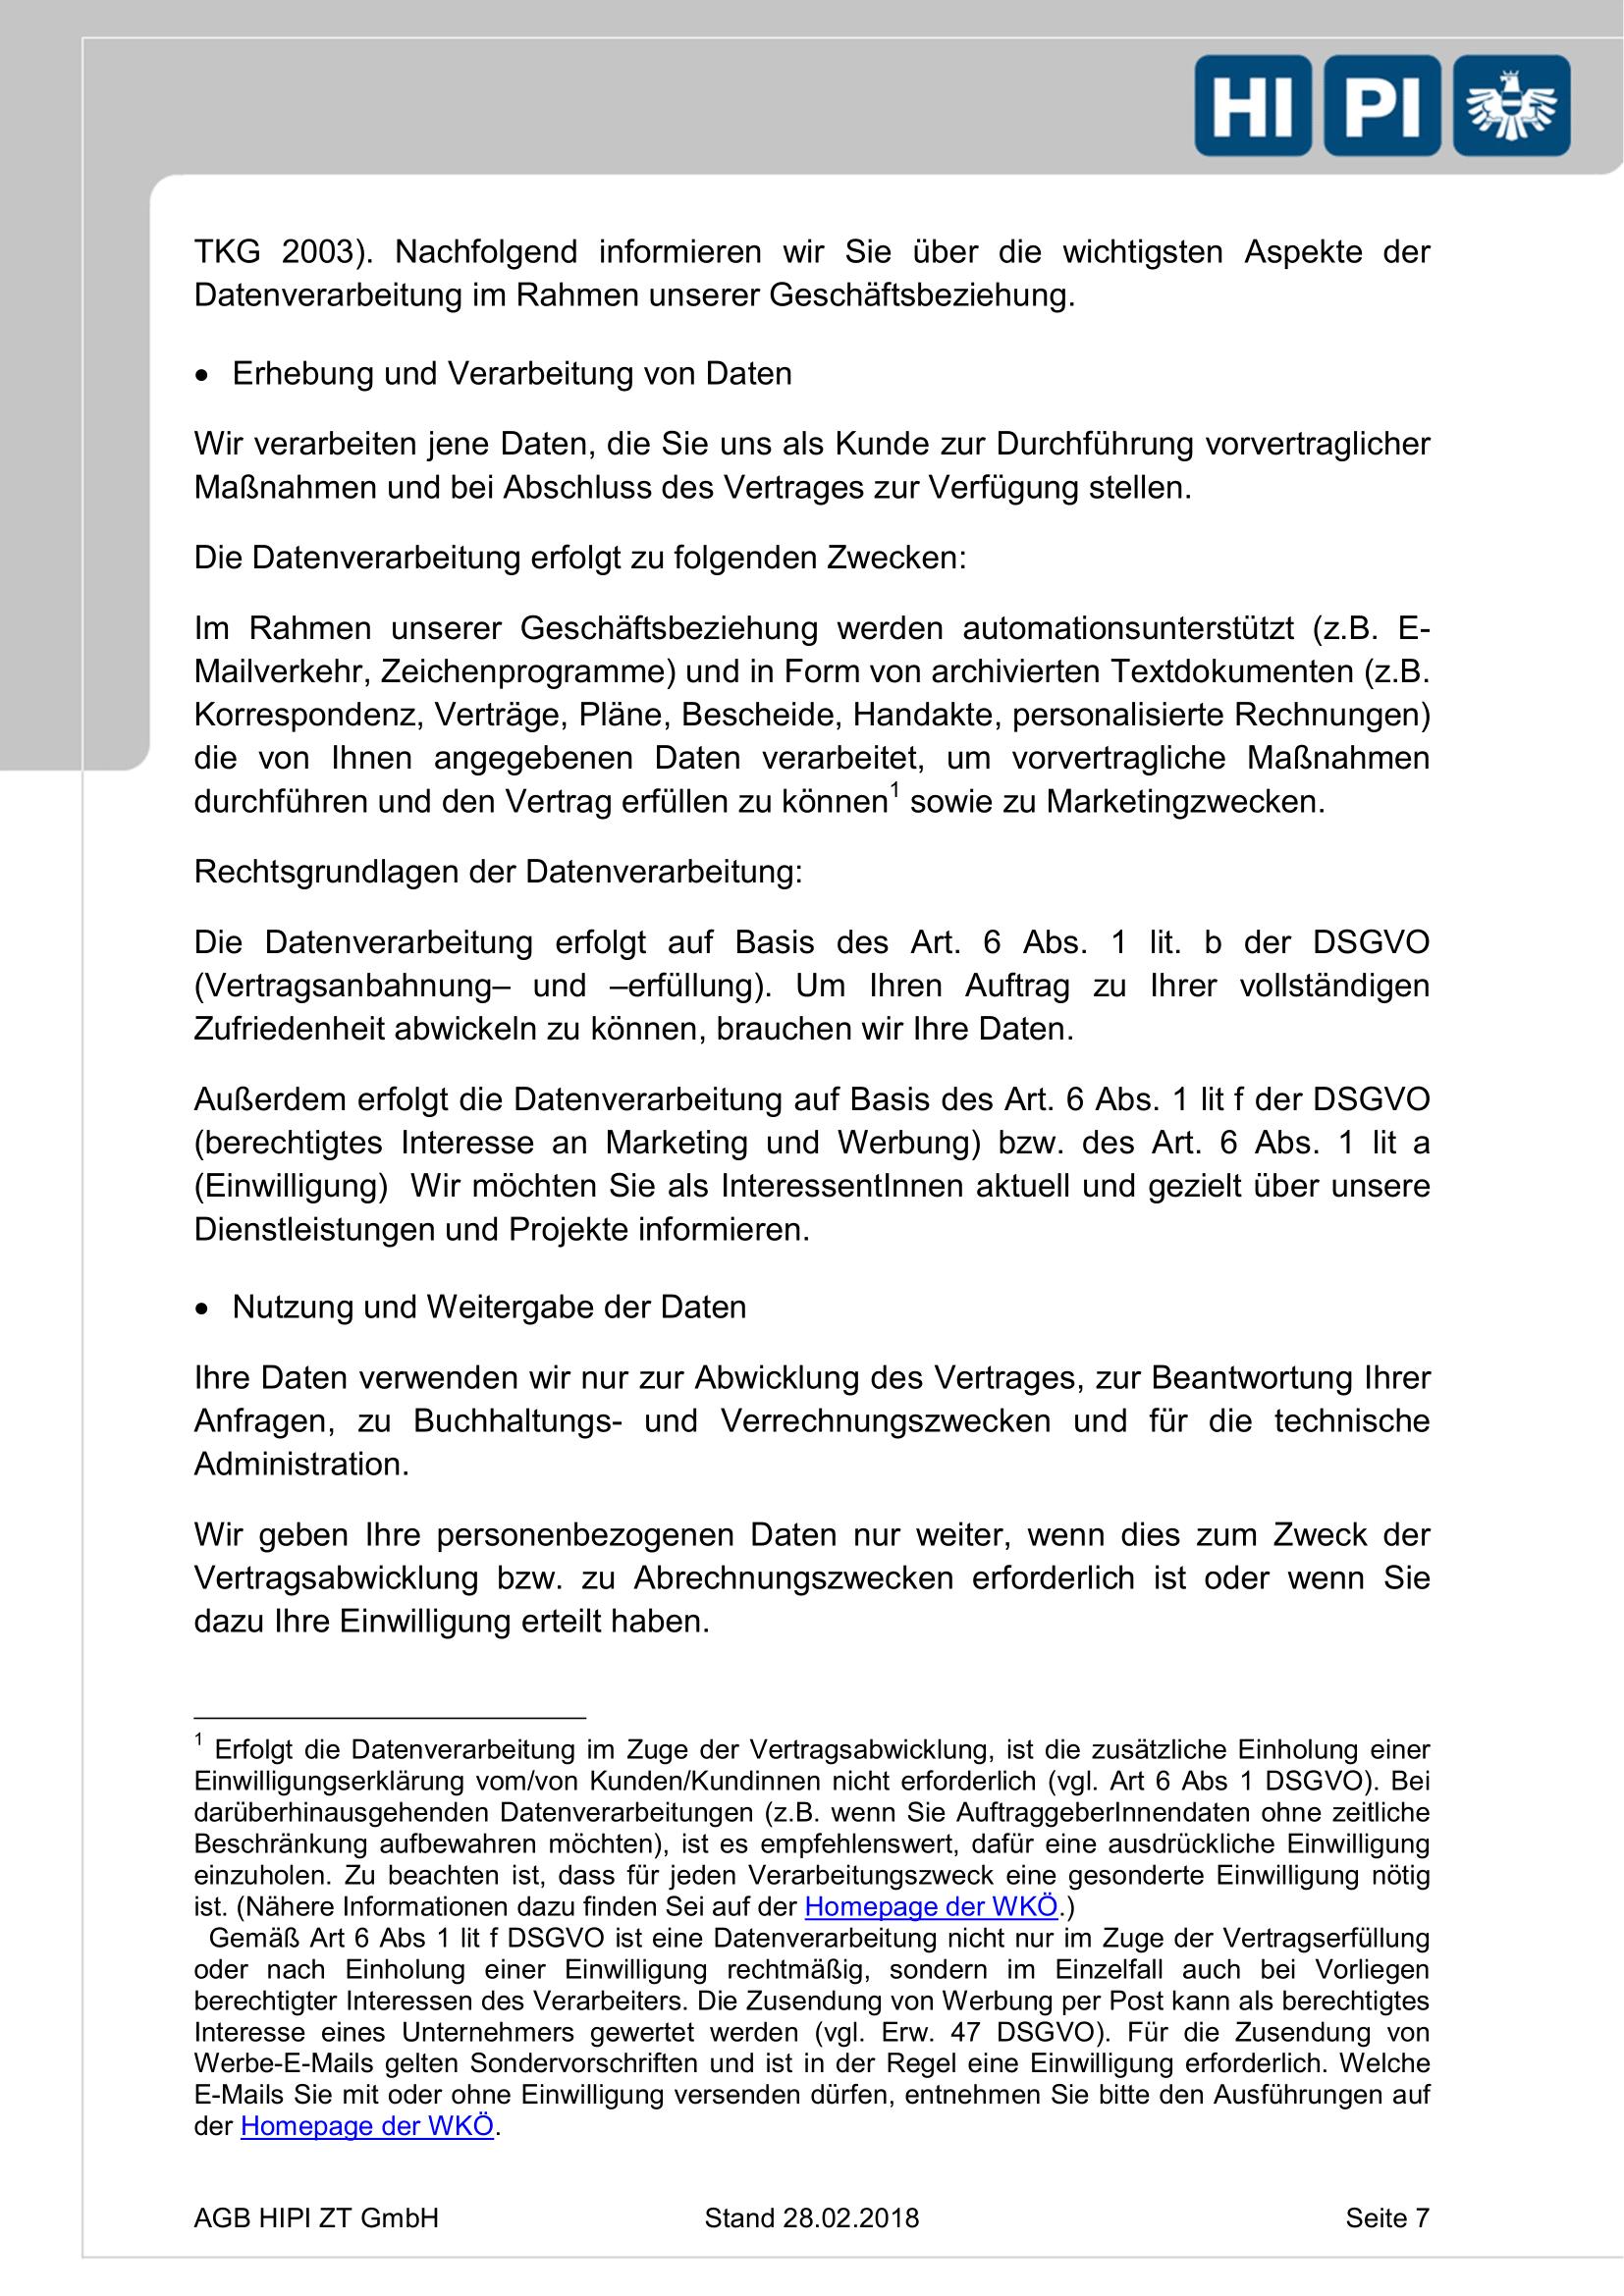 HIPI ZT GmbH AGB Seite 7